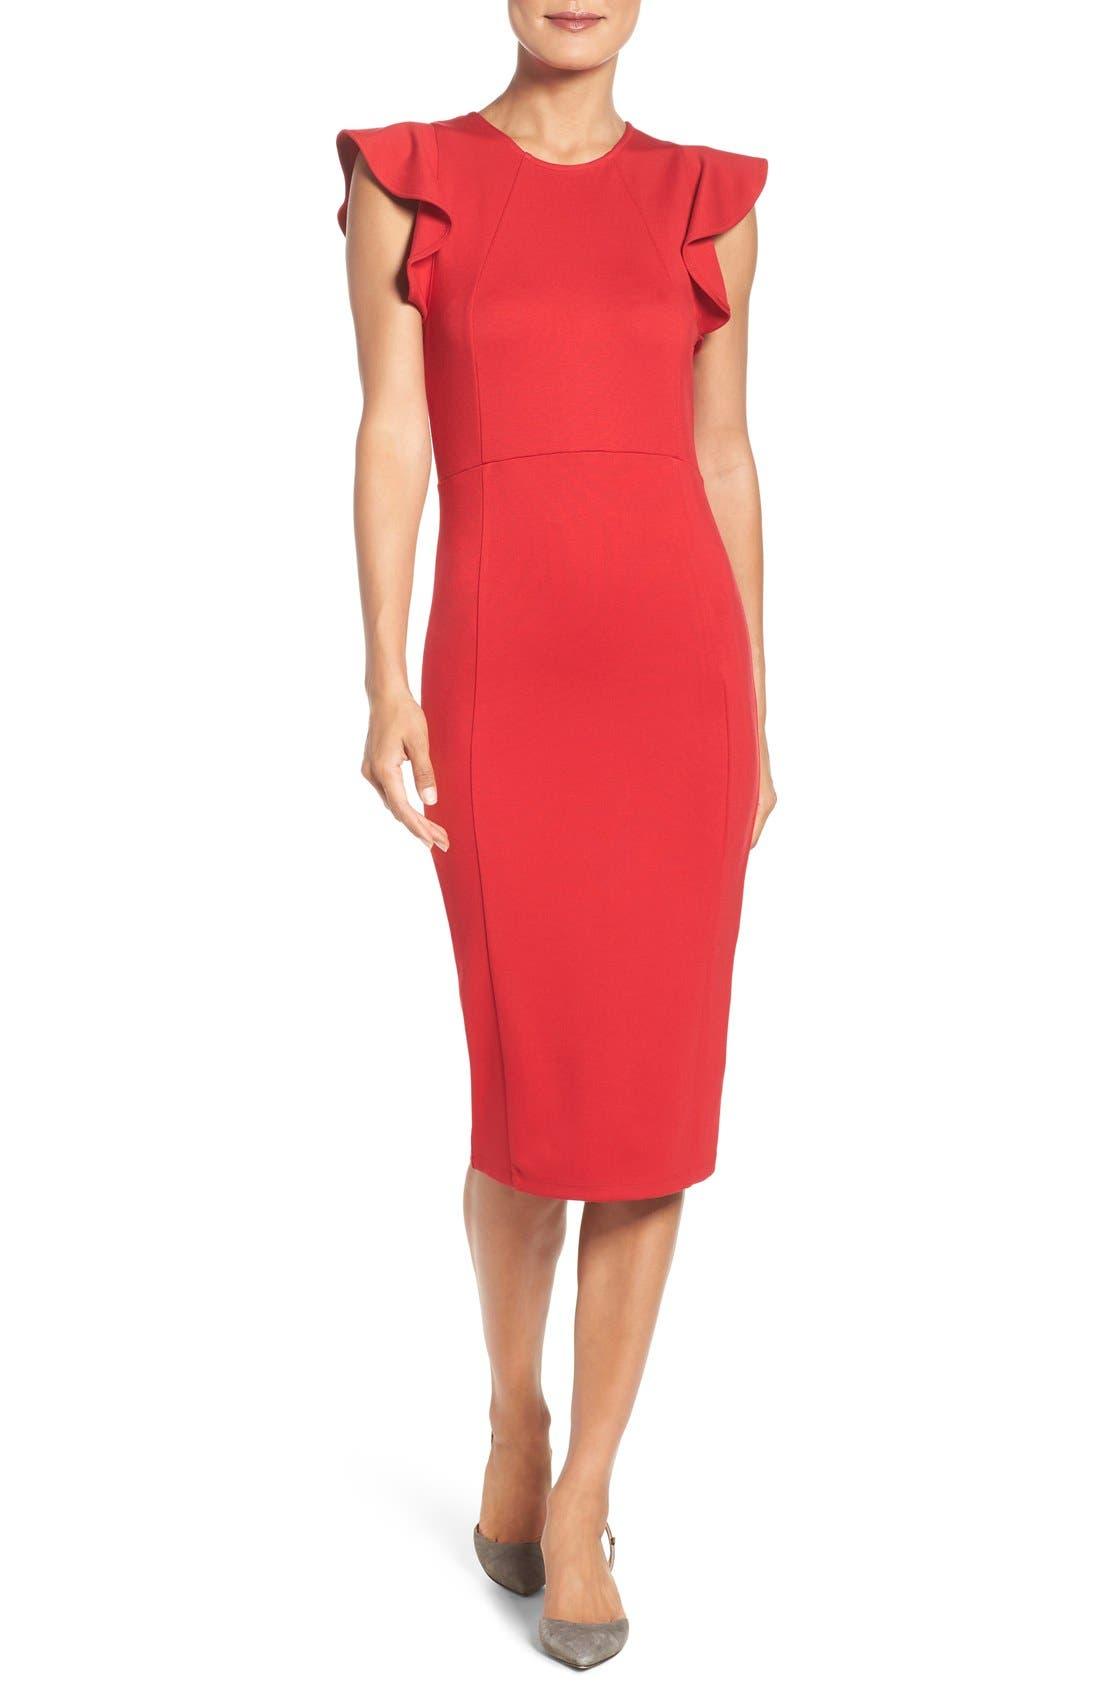 Felicity & Coco Ruffle Sheath Dress (Nordstrom Exclusive)